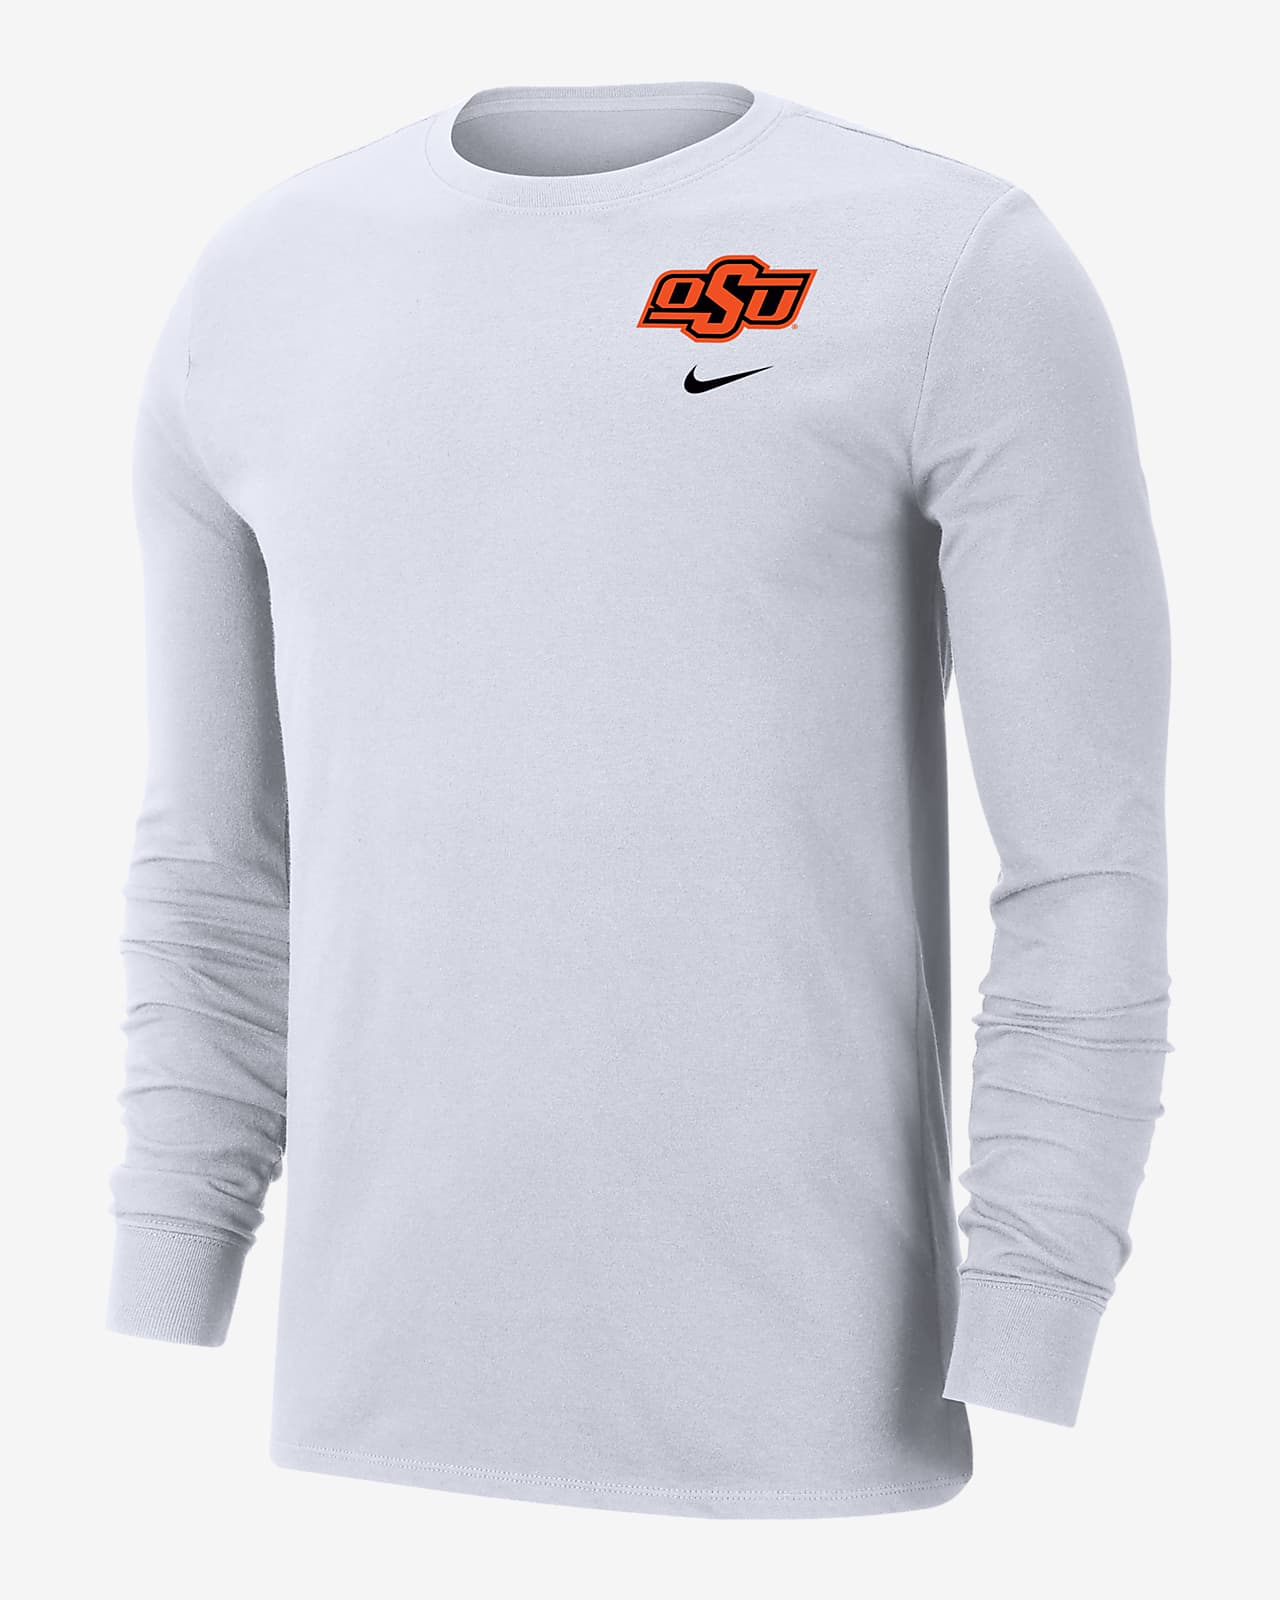 Nike College (Oklahoma State) Men's Long-Sleeve T-Shirt